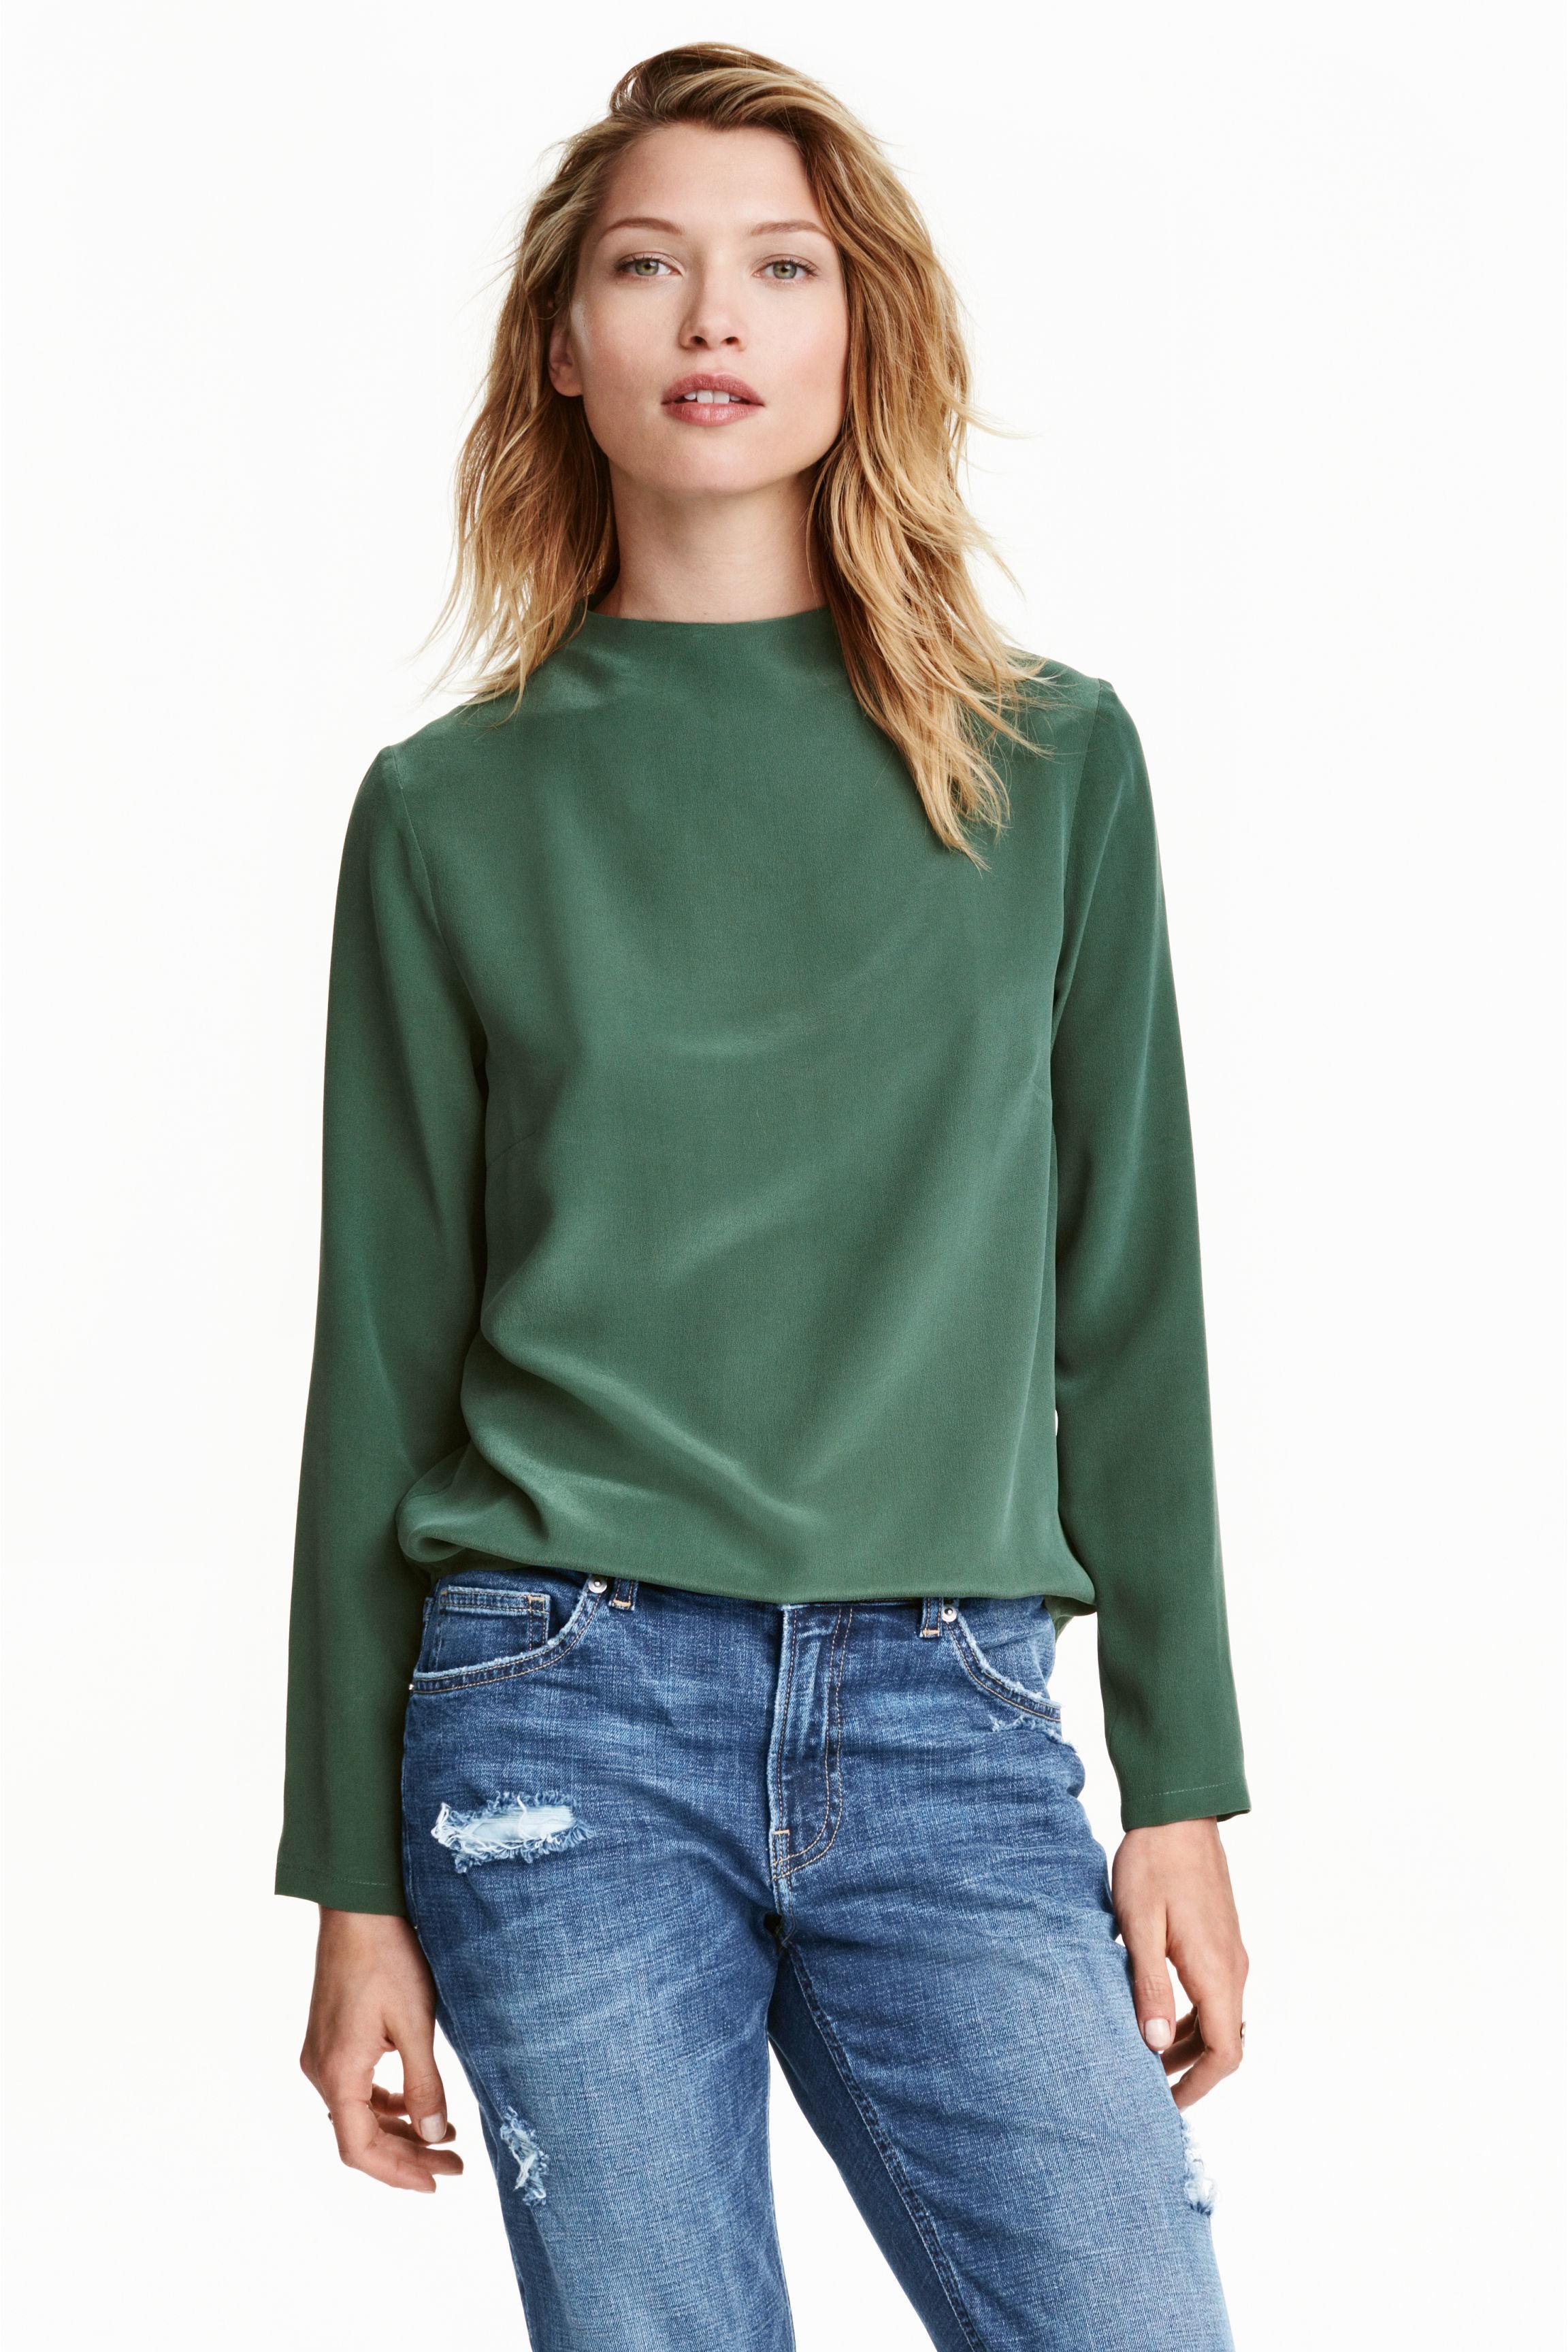 Green Blouse H&M 120